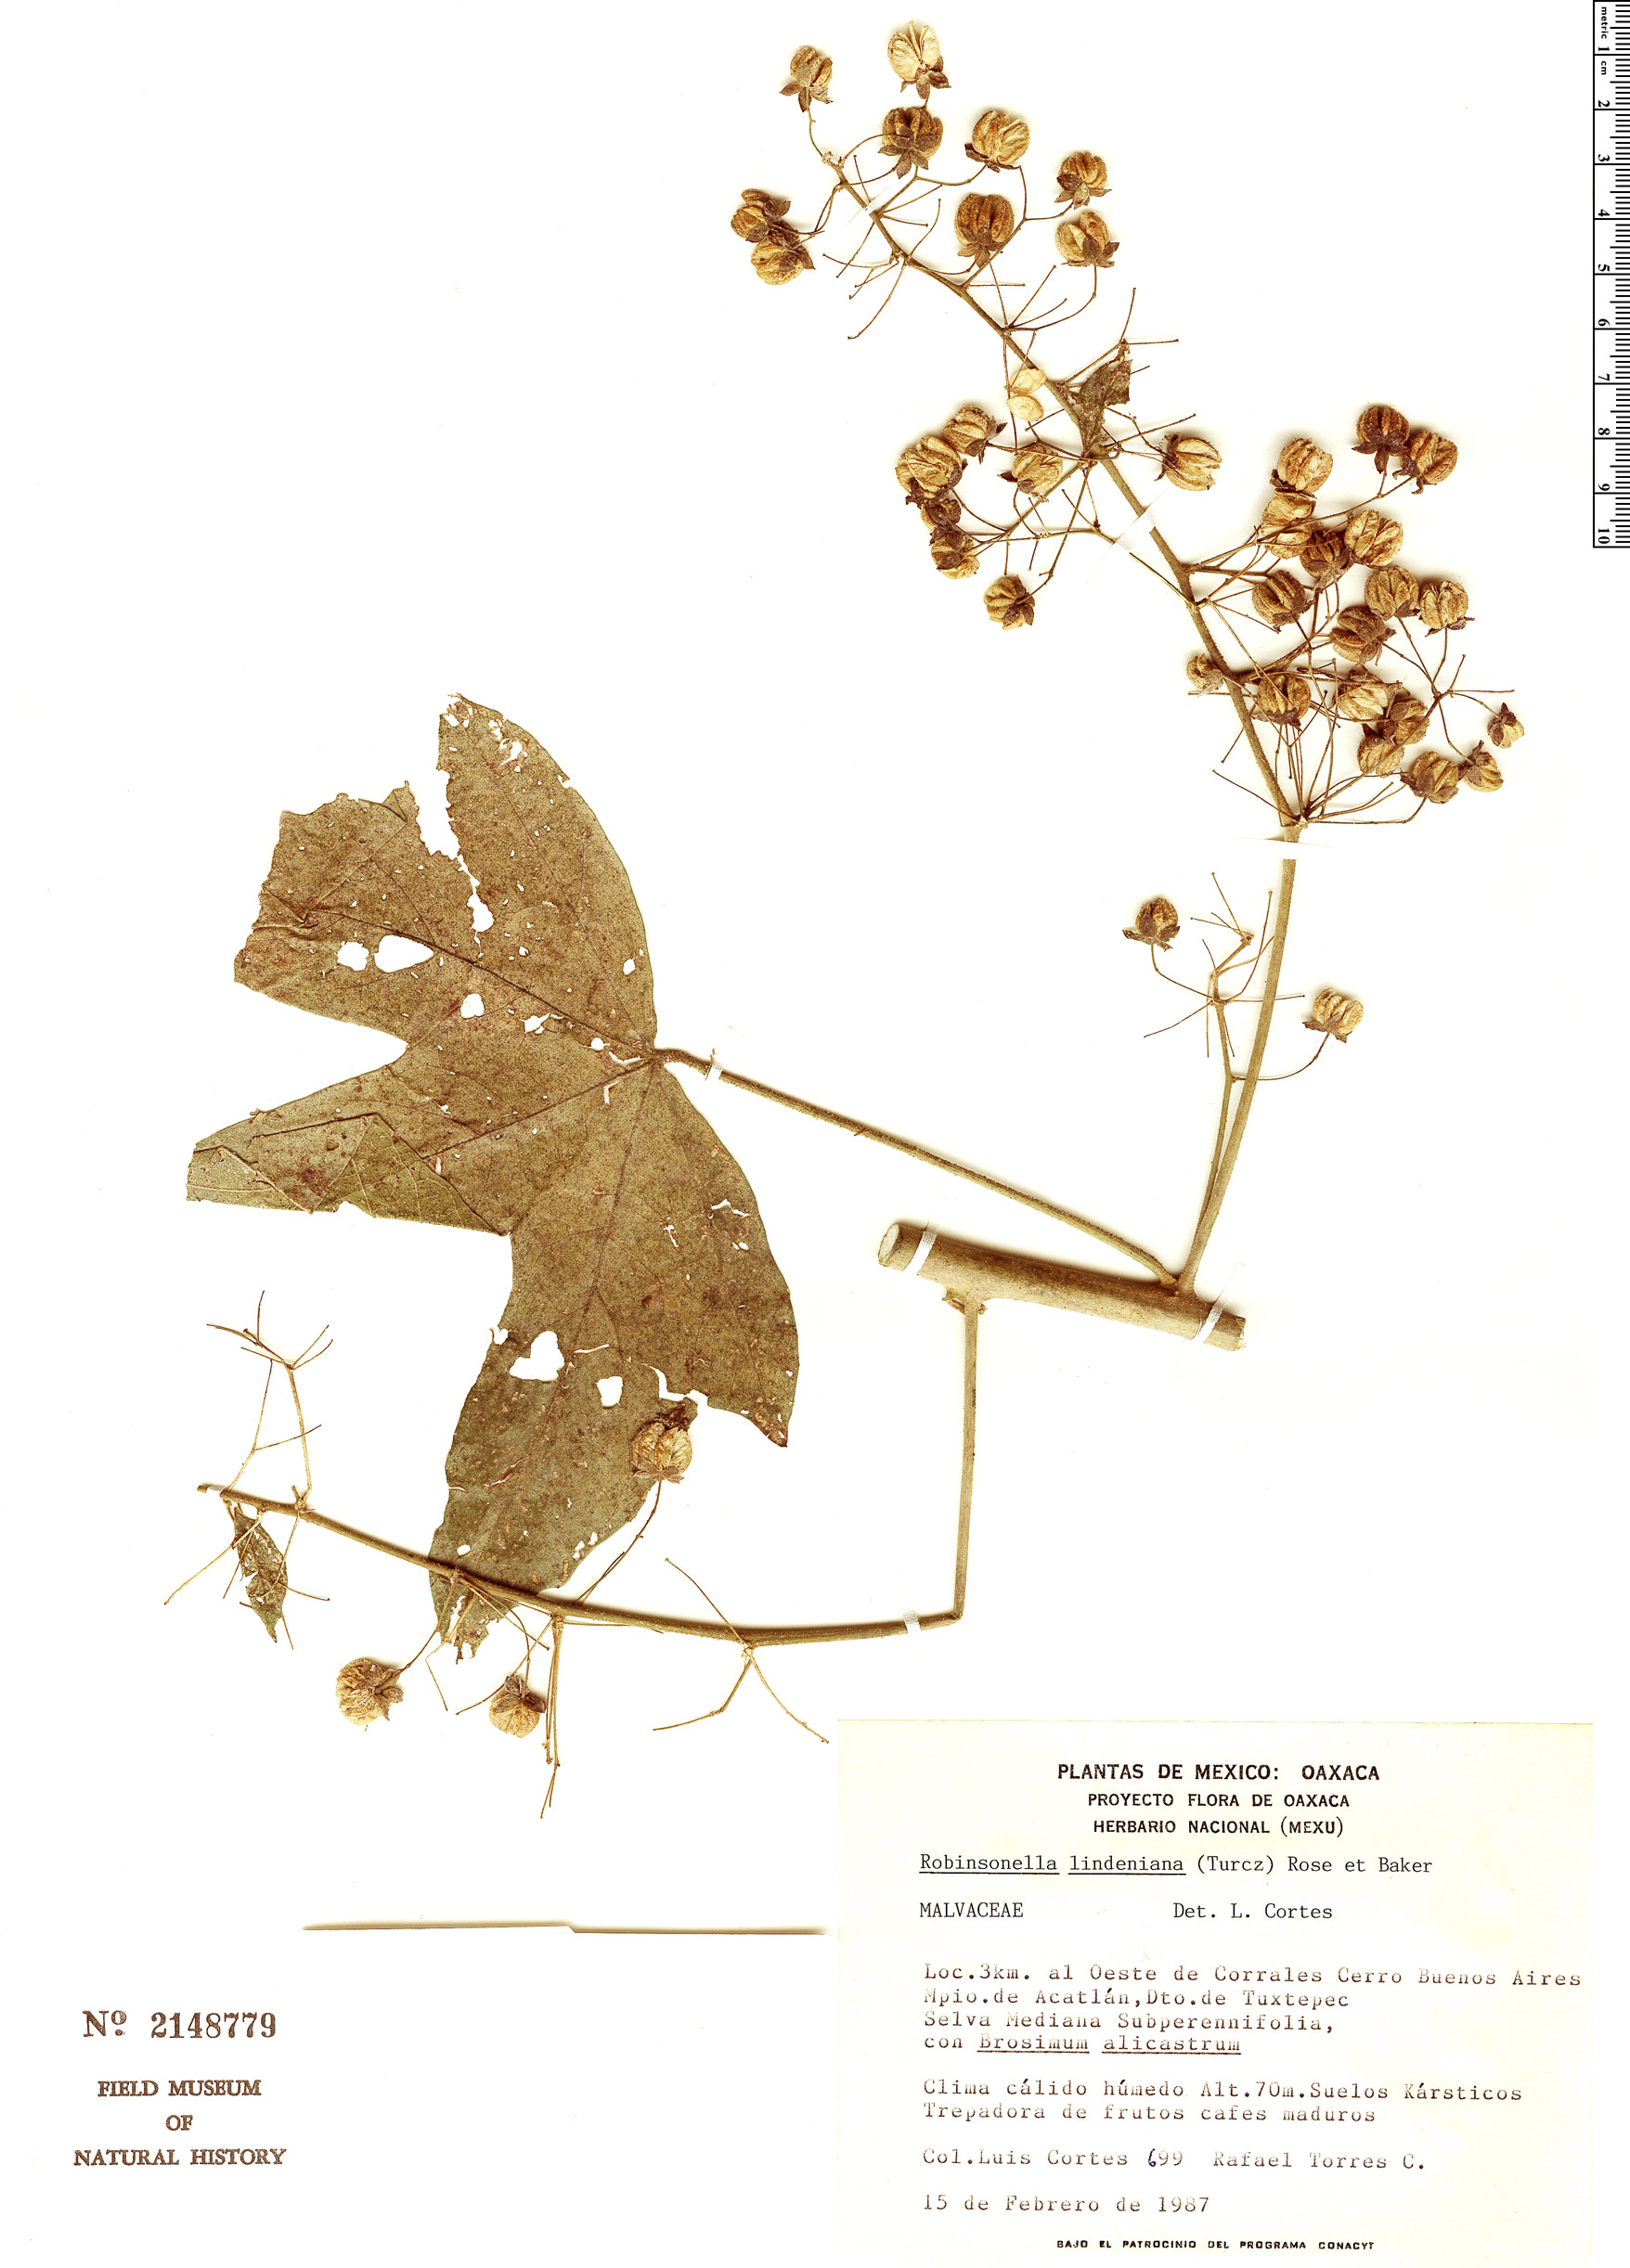 Specimen: Robinsonella lindeniana